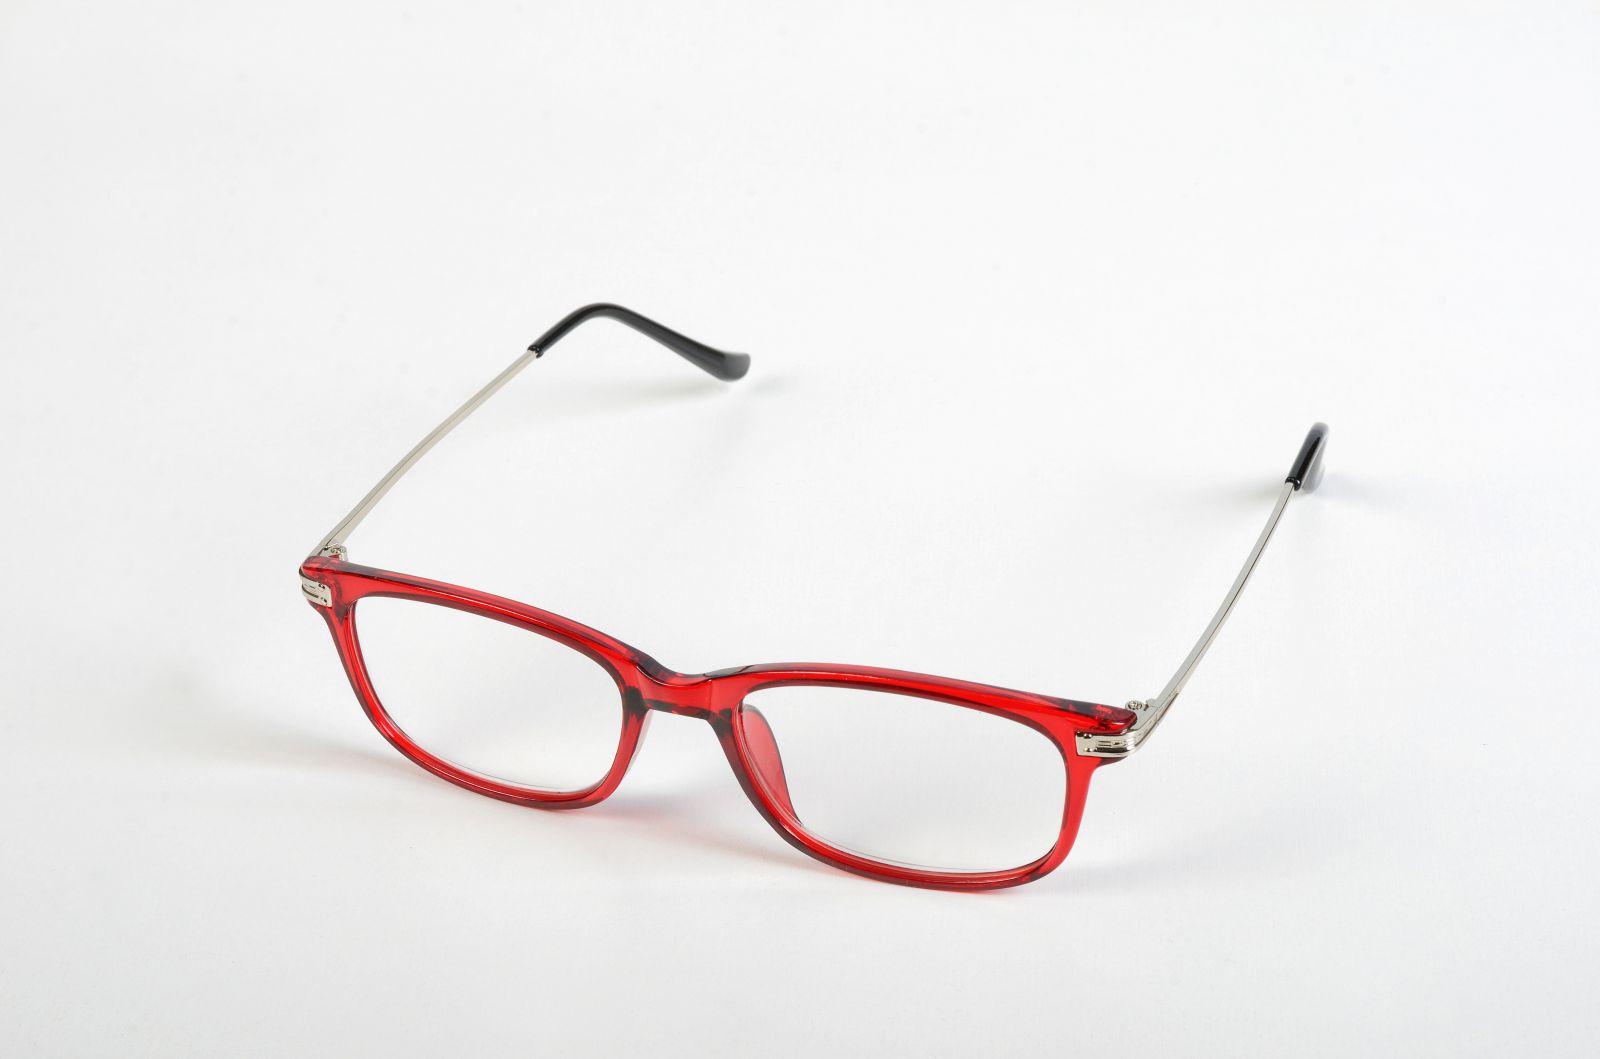 Dioptrické brýle 1807 +3,0